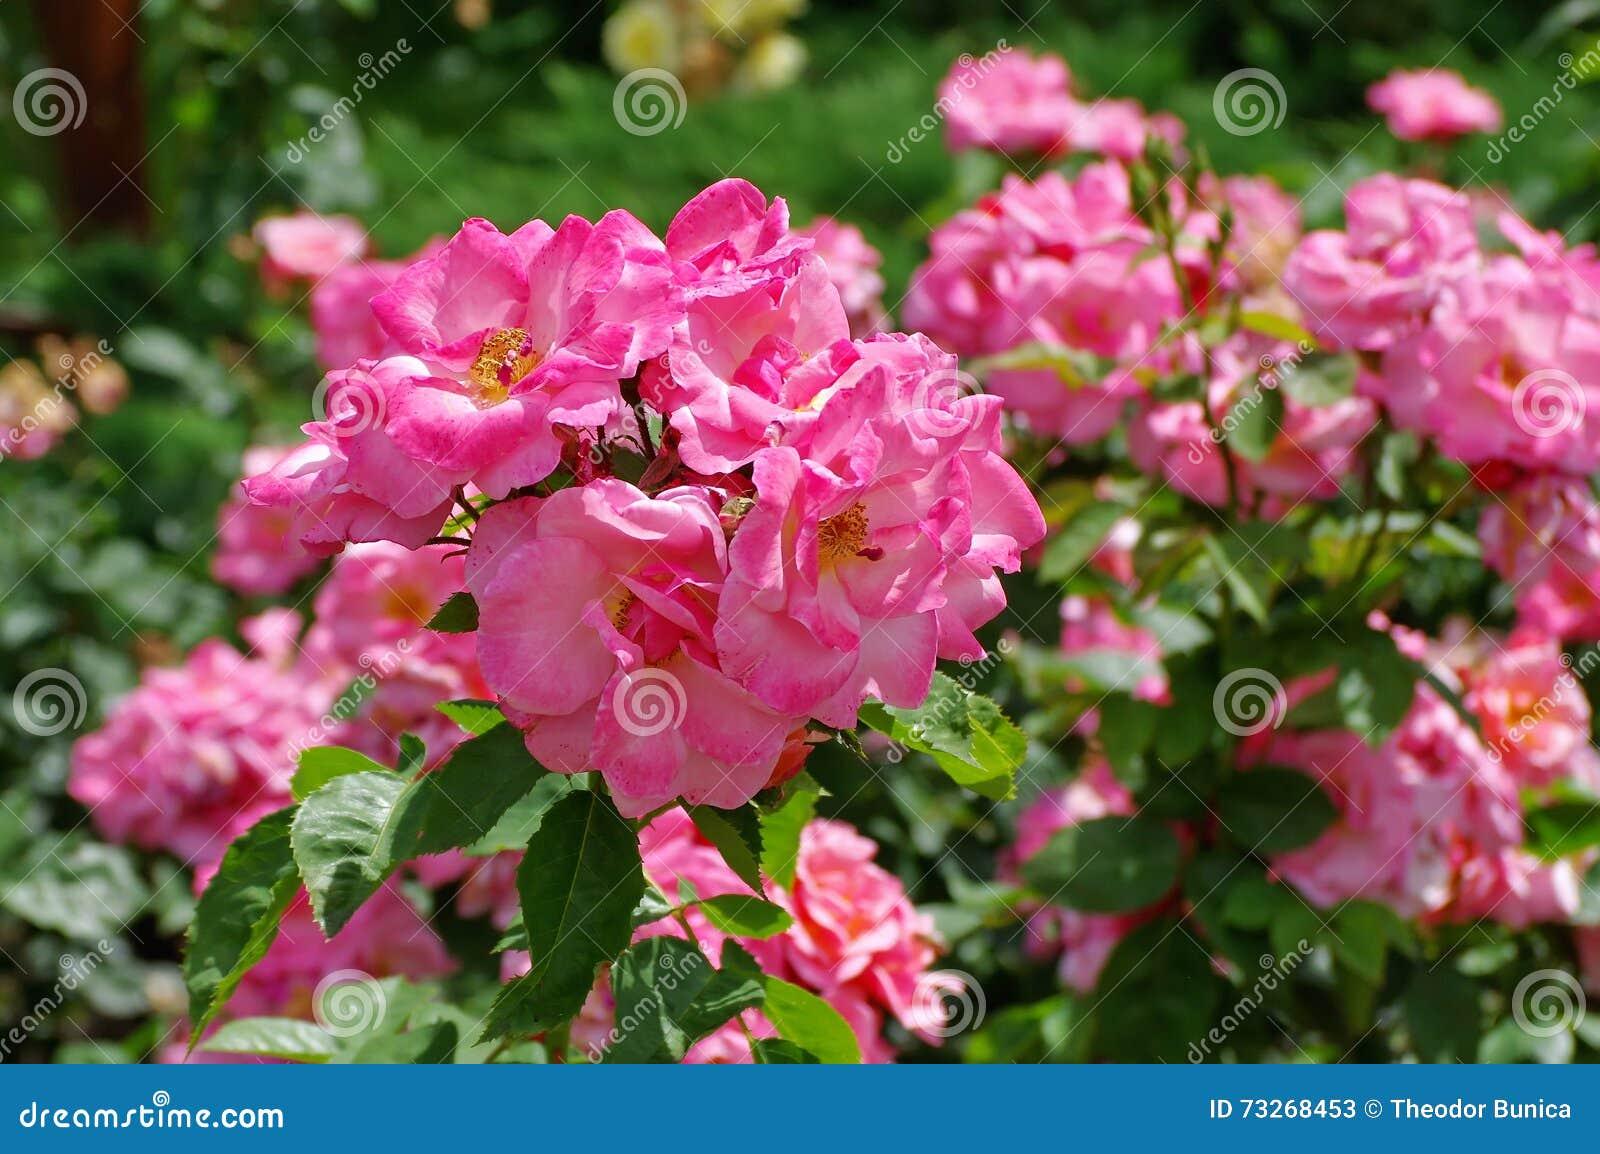 Schöne rosafarbene Rosen